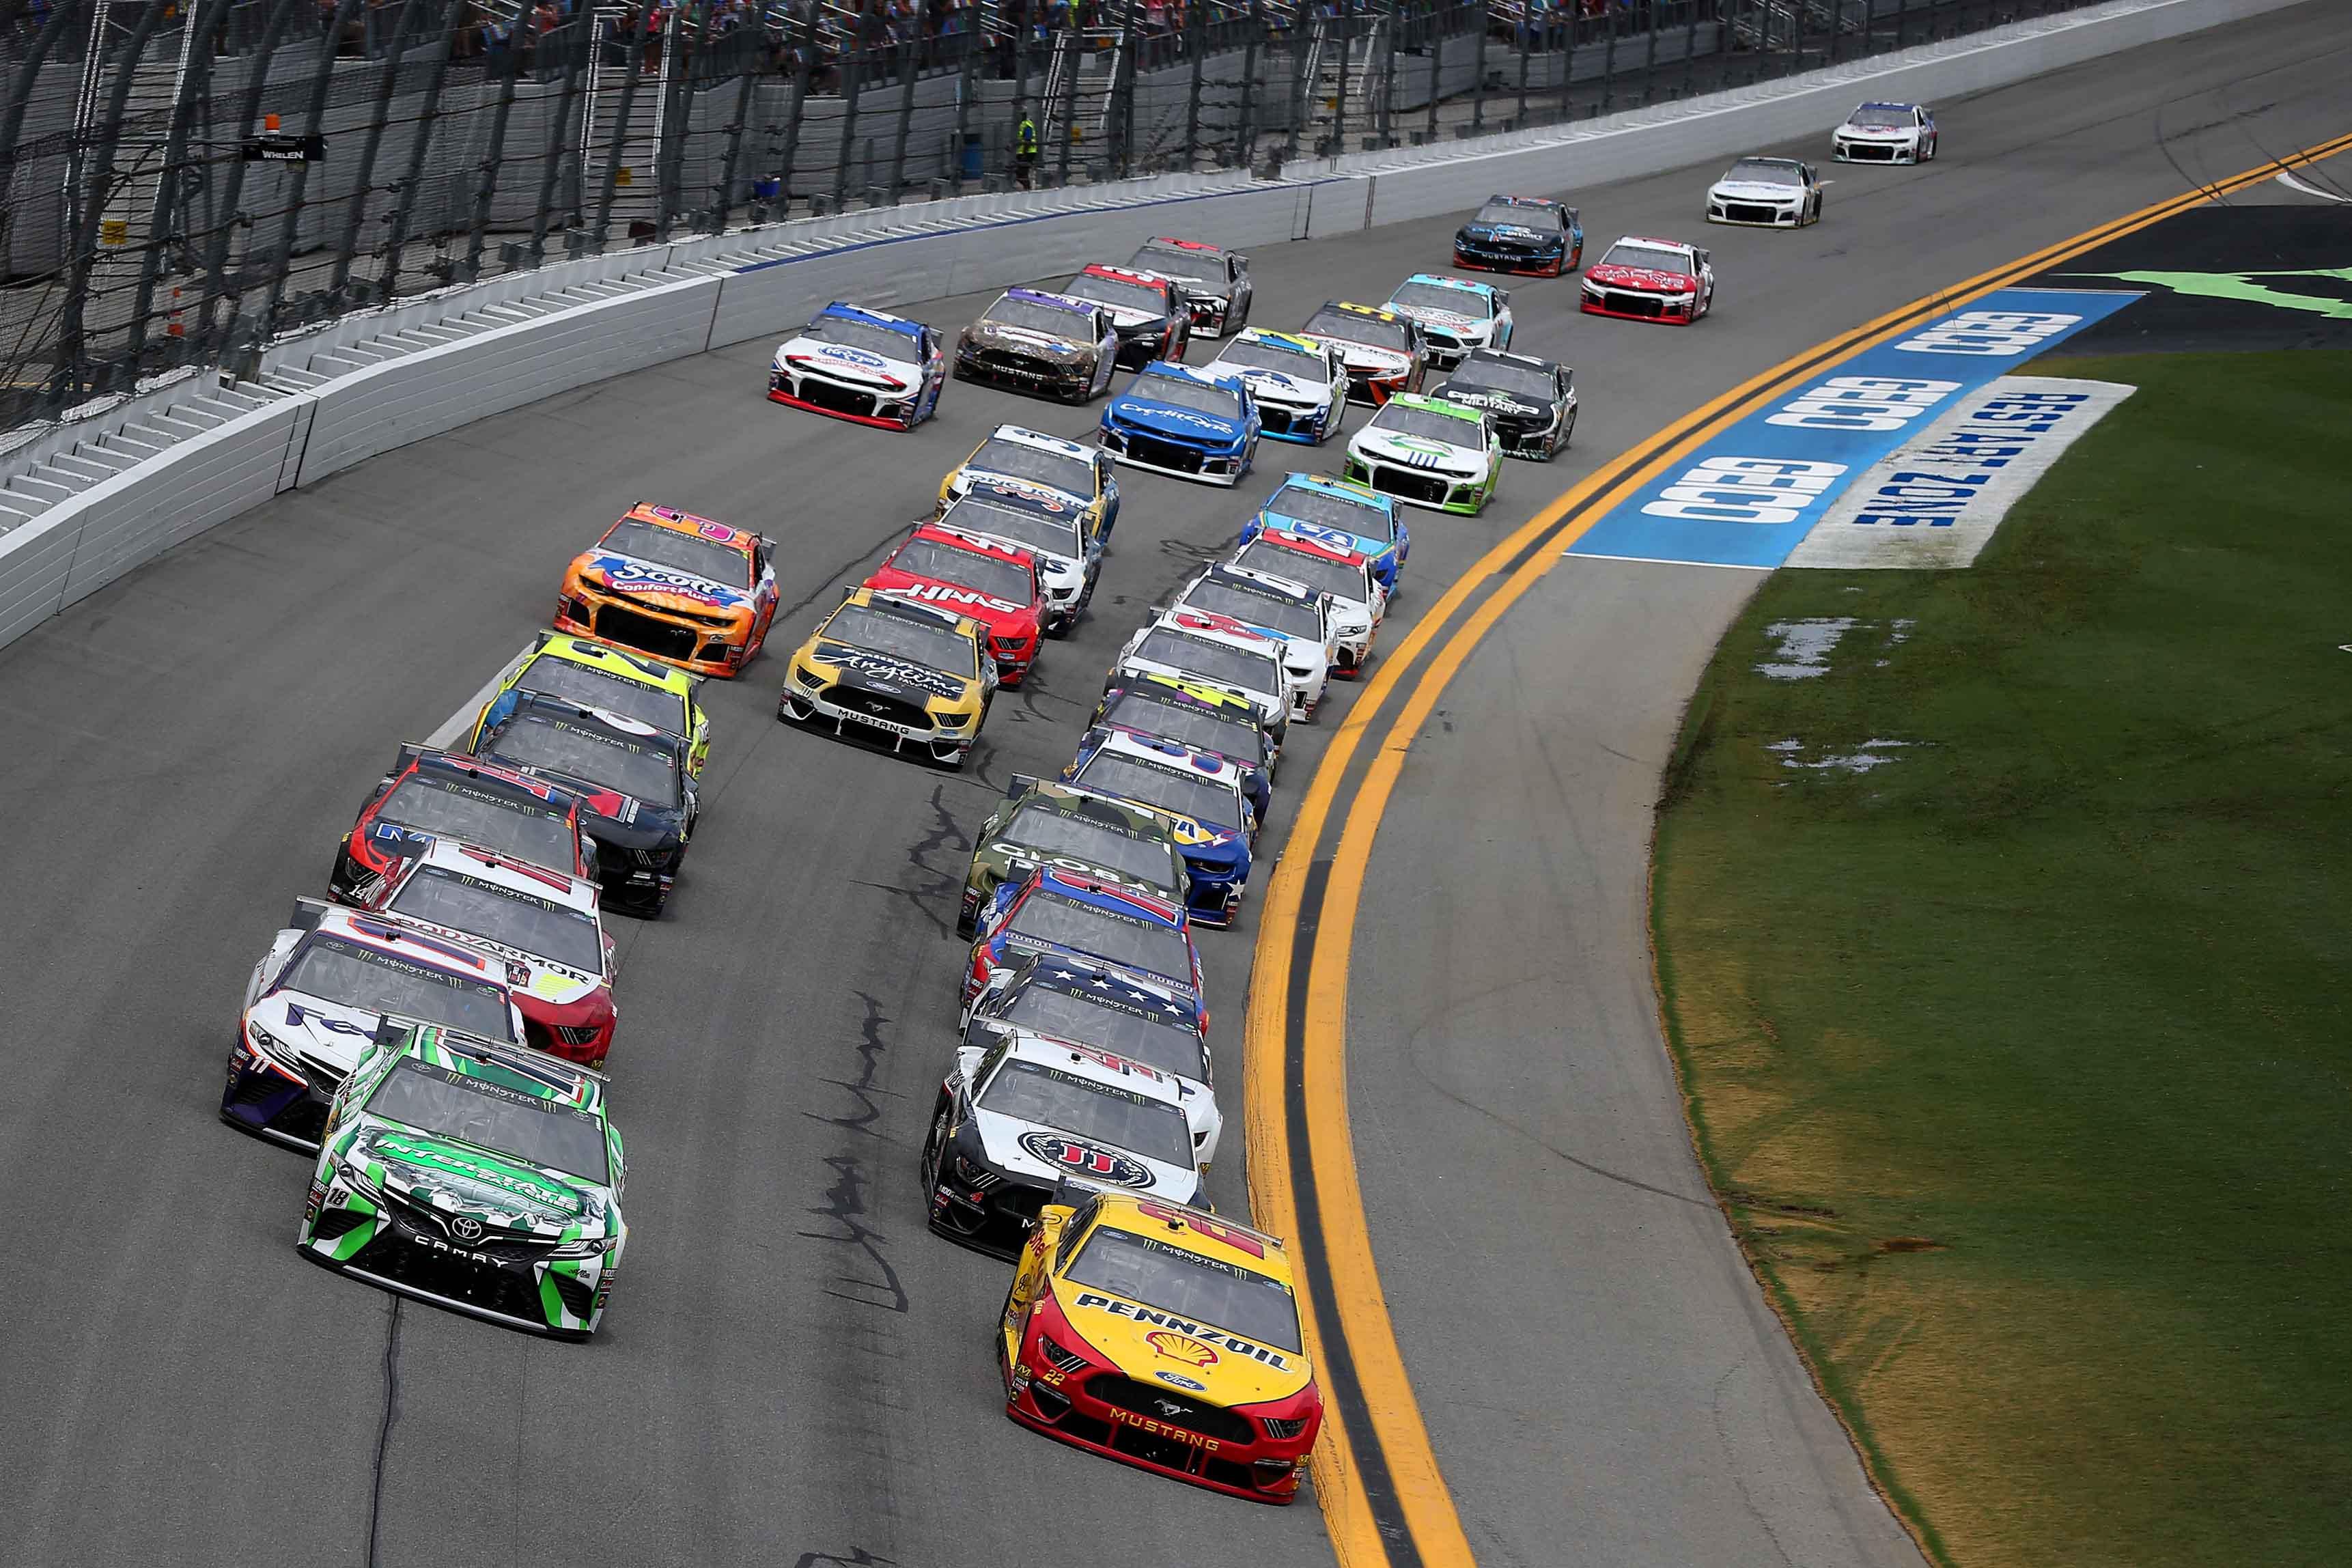 Daytona Dog Track >> Daytona Race Results July 7 2019 Nascar Cup Series Racing News